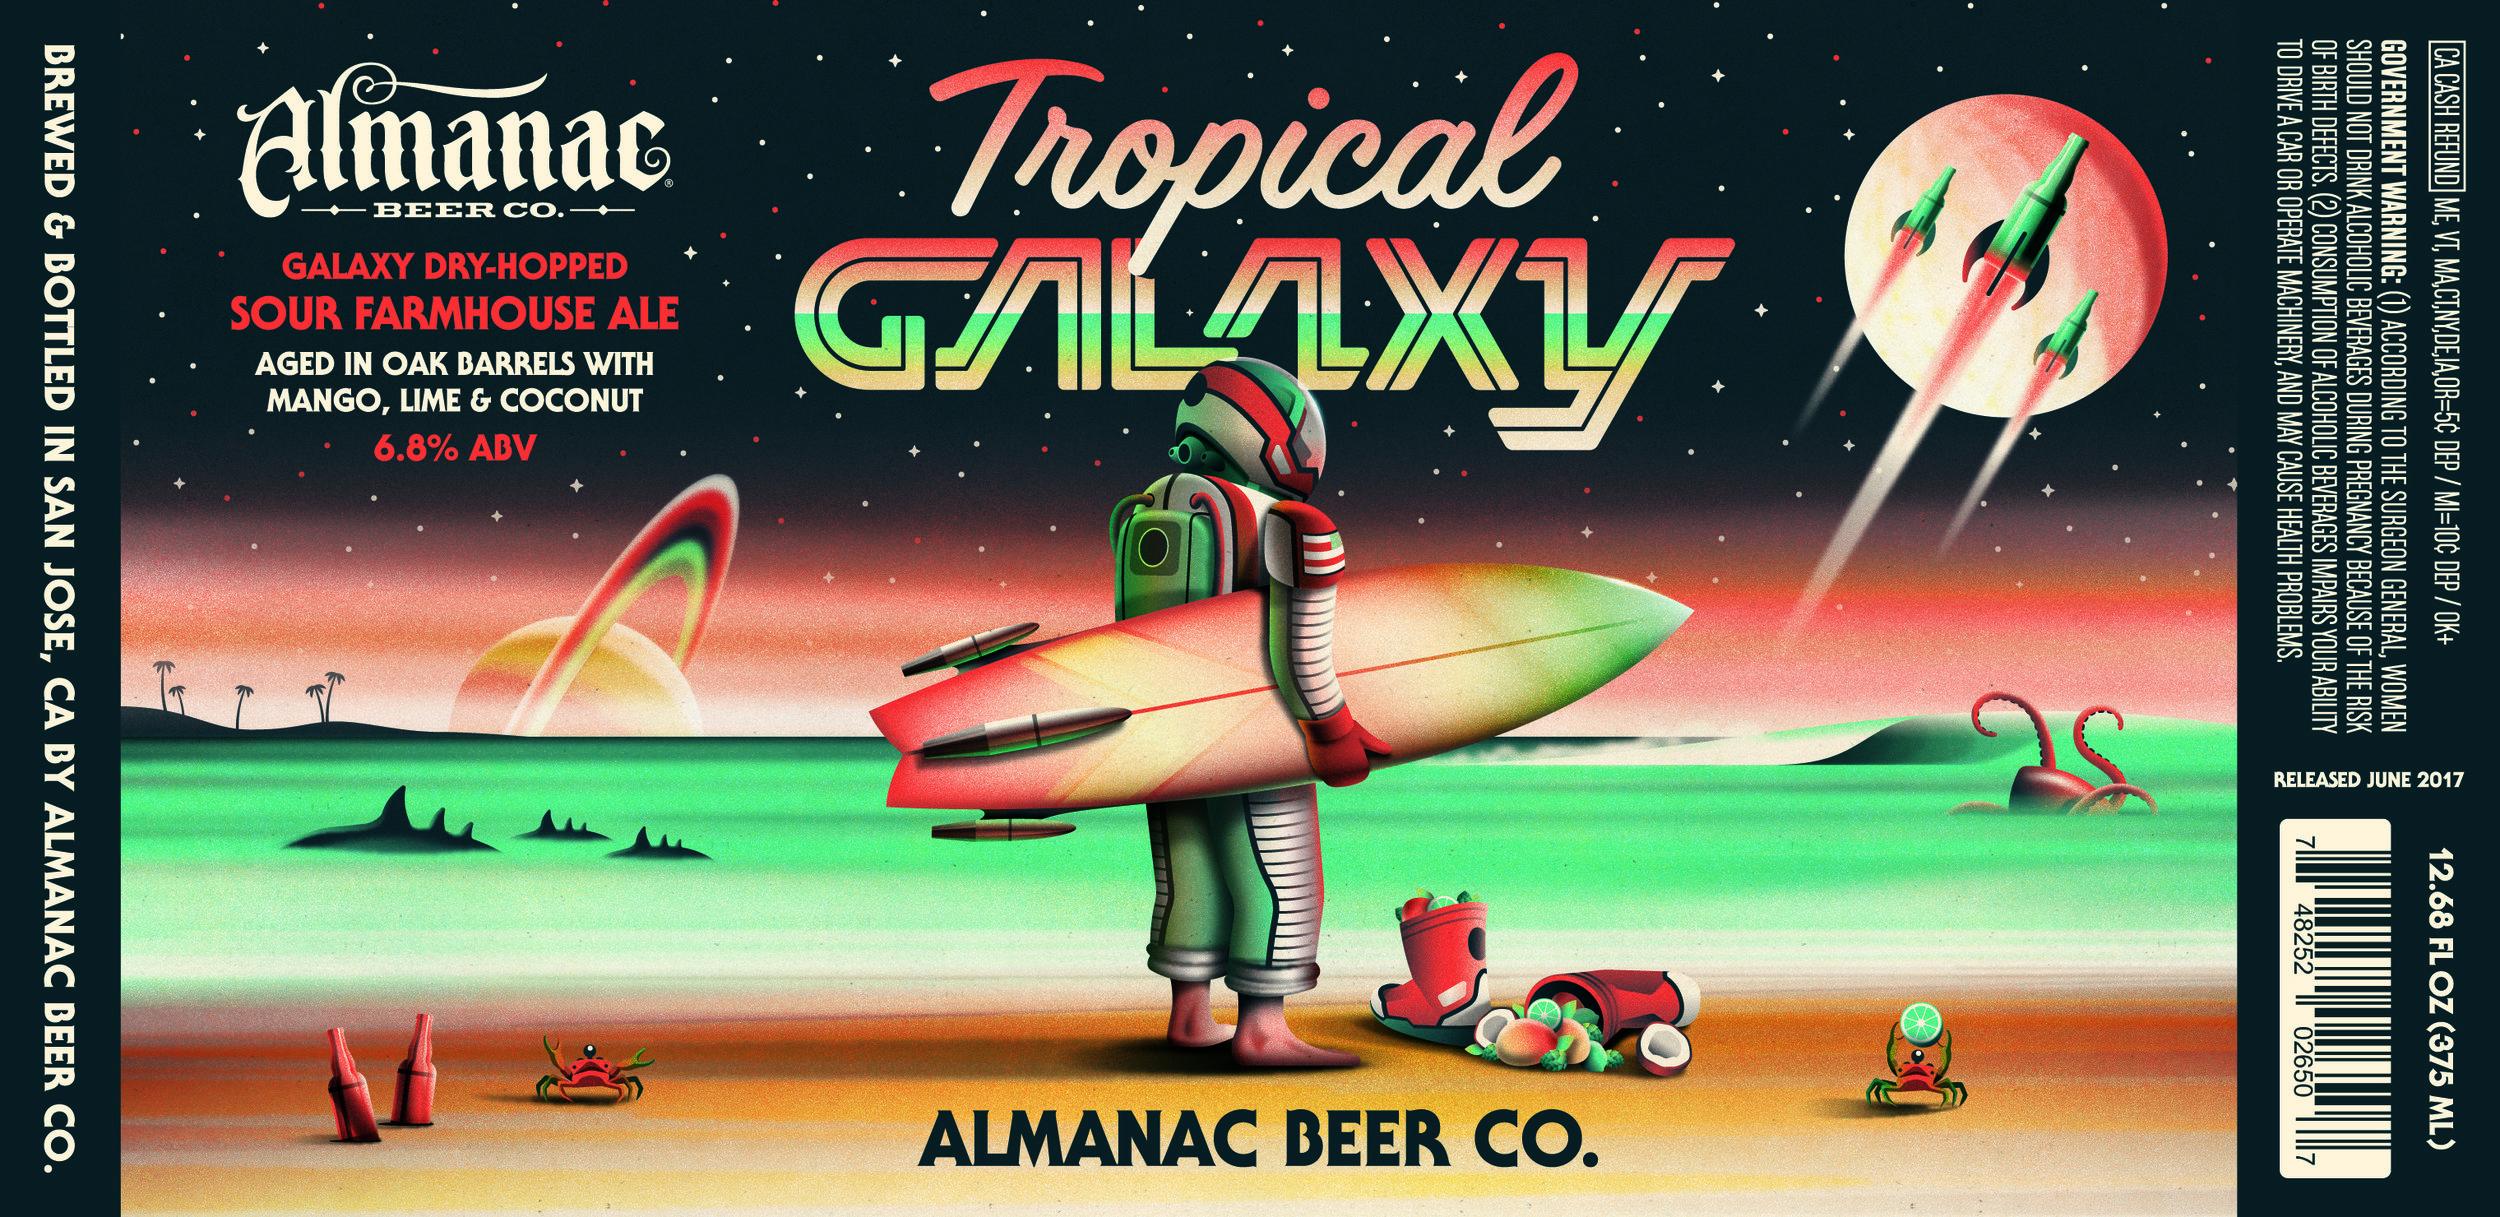 tropical_galaxy_label_final_high_res-01.jpg